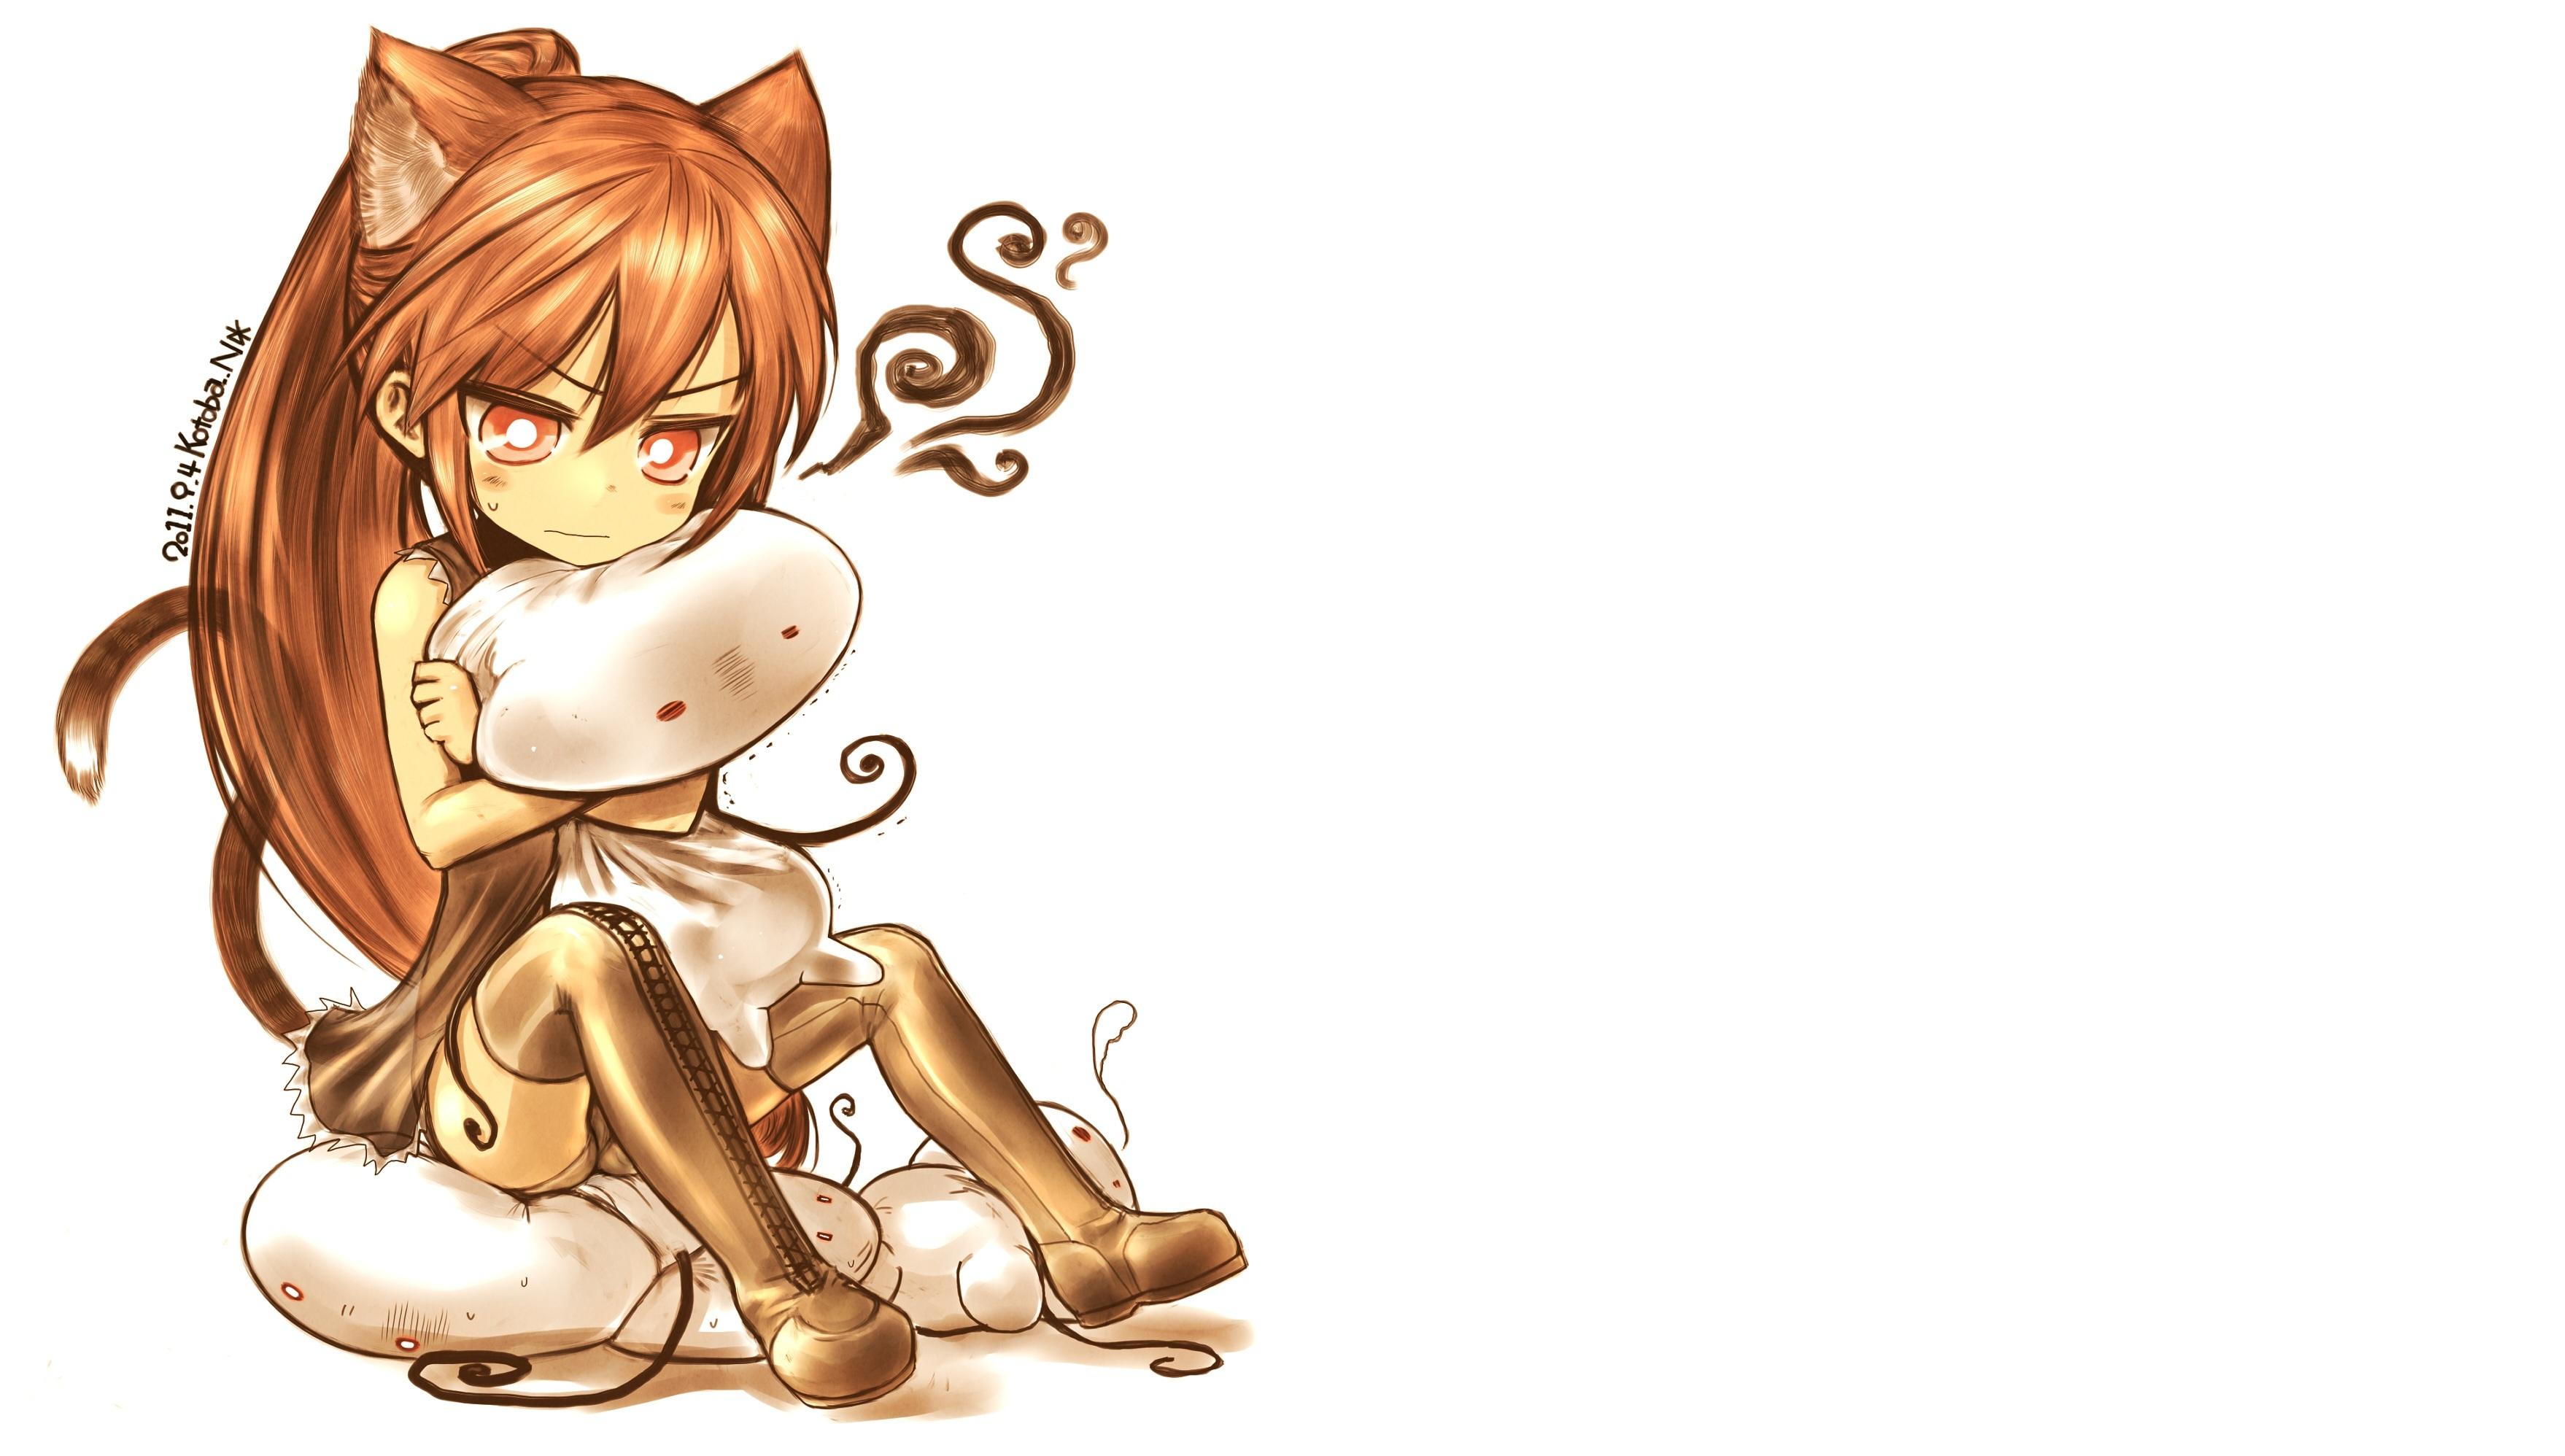 аниме девочки кошки картинки: